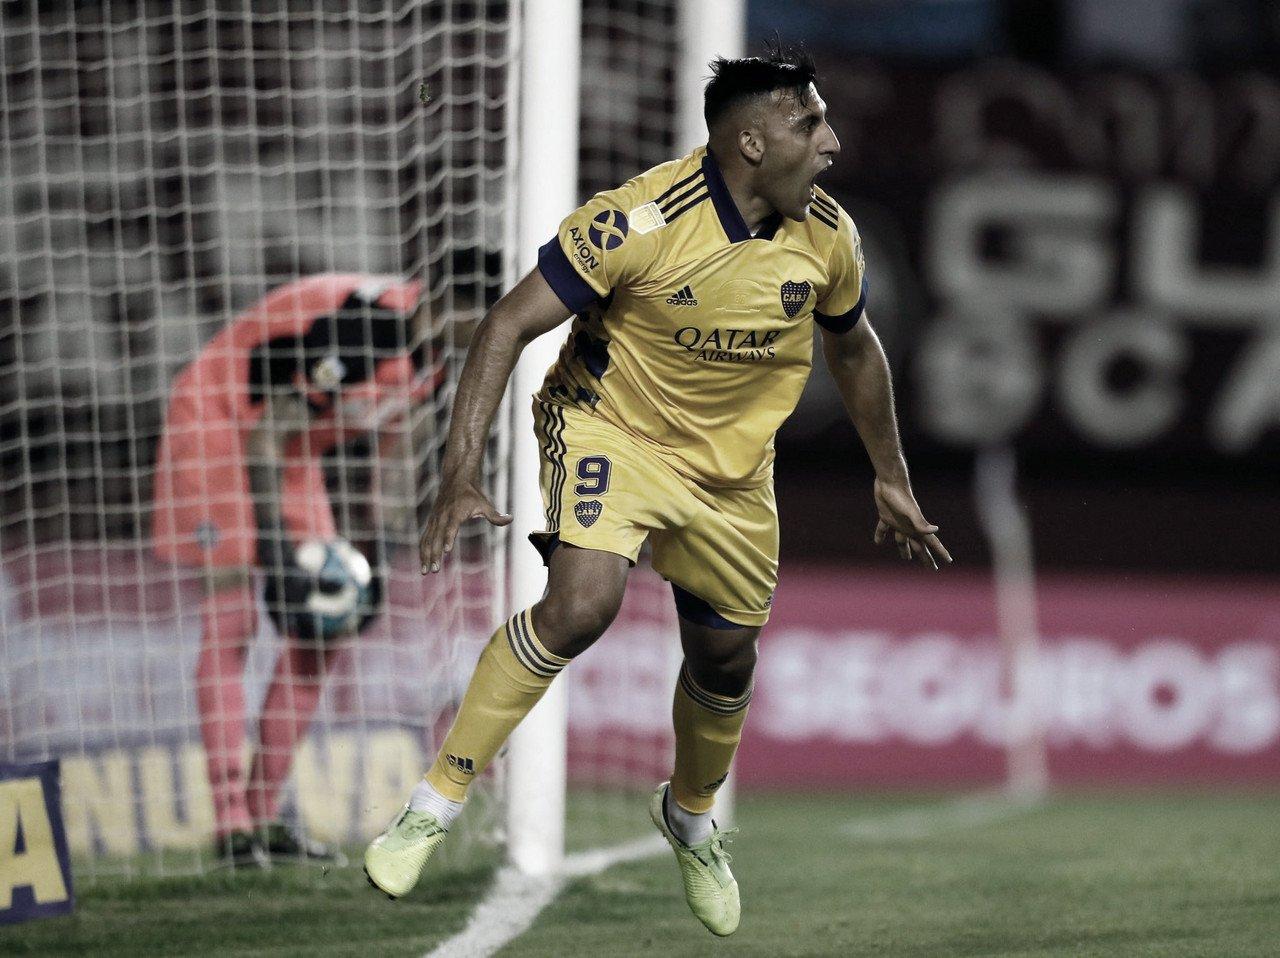 Foto: Prensa Boca.